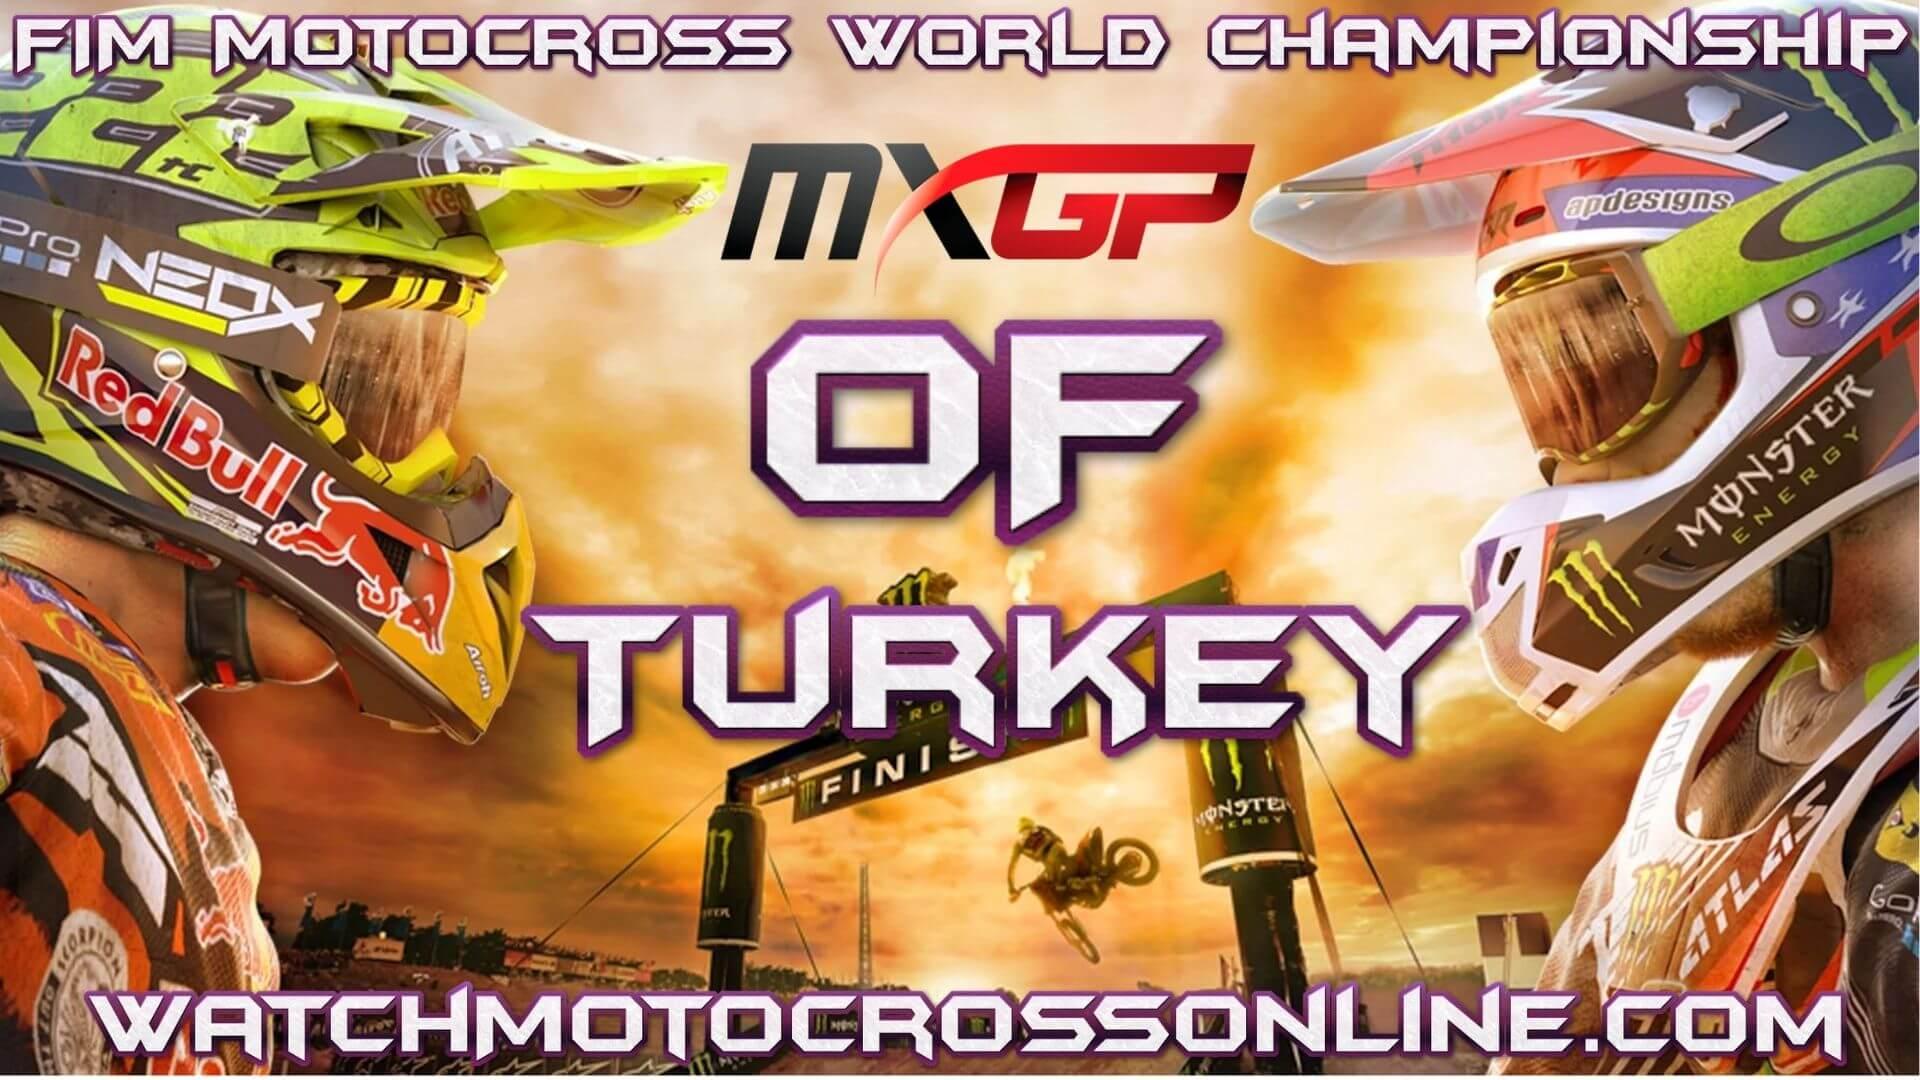 MXGP of Turkey Live Stream 2020